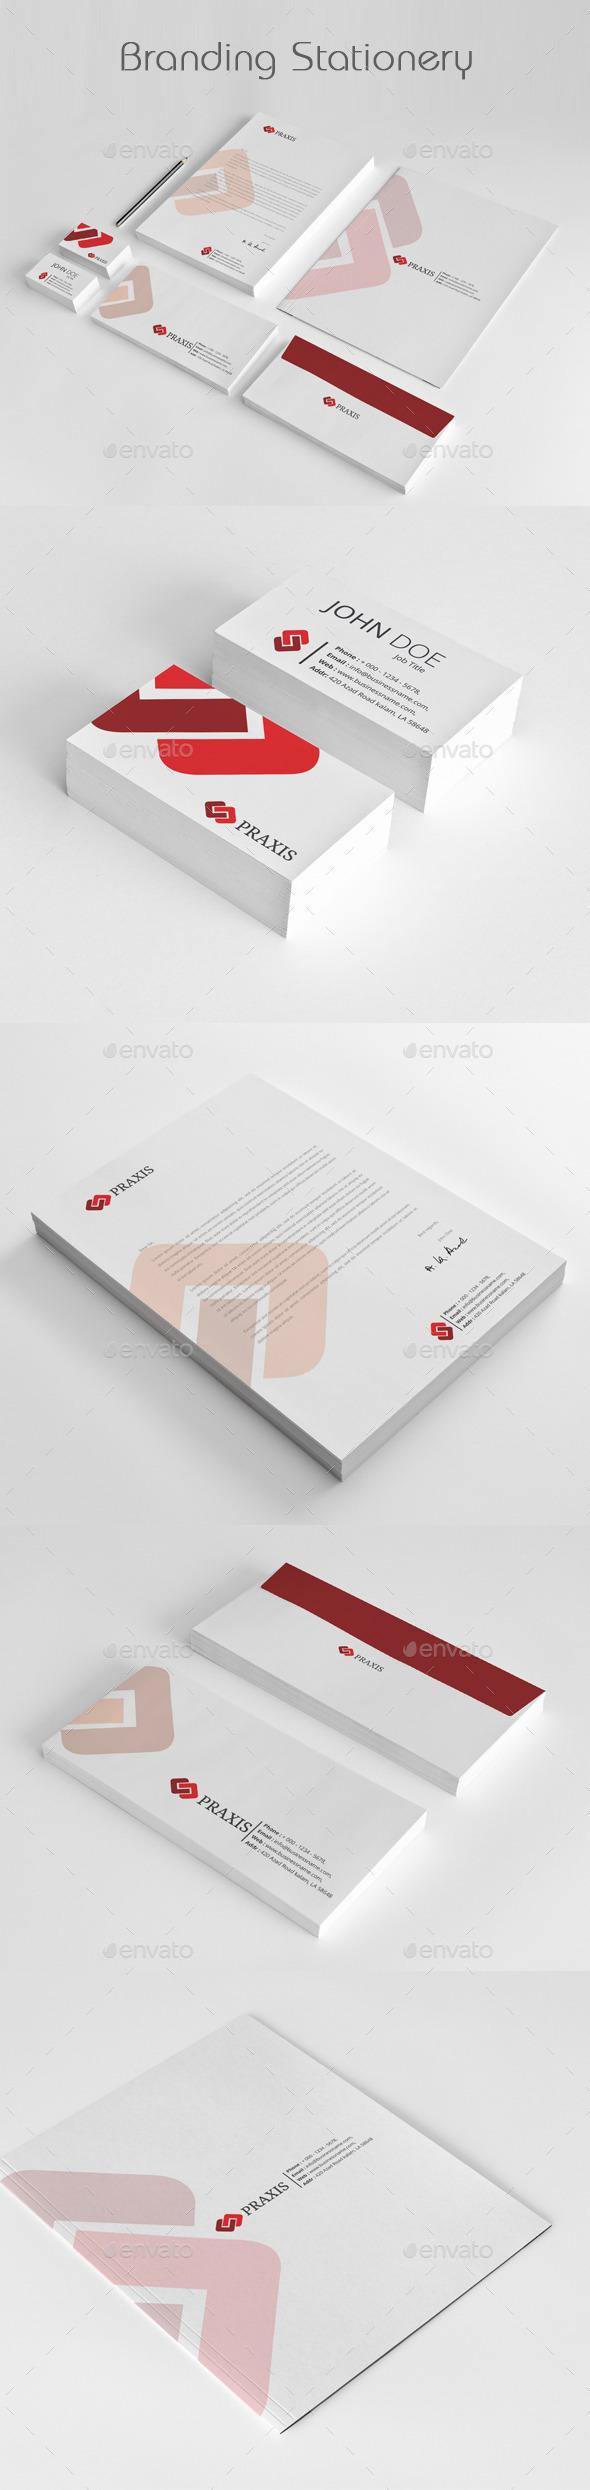 Branding Stationery Templates - Stationery Print Templates